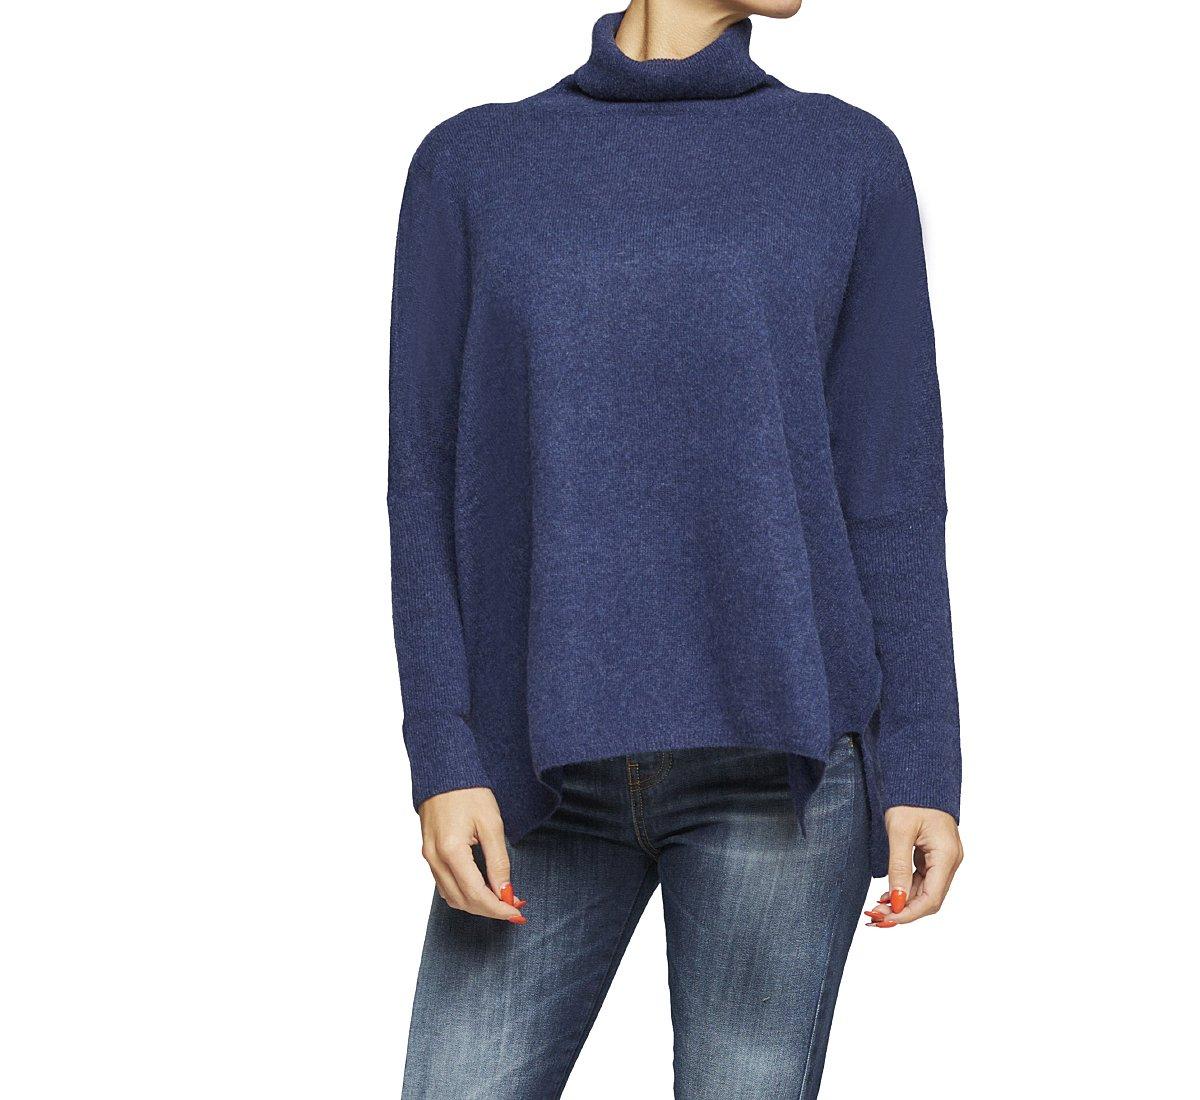 Sweater in fine, warm cashmere